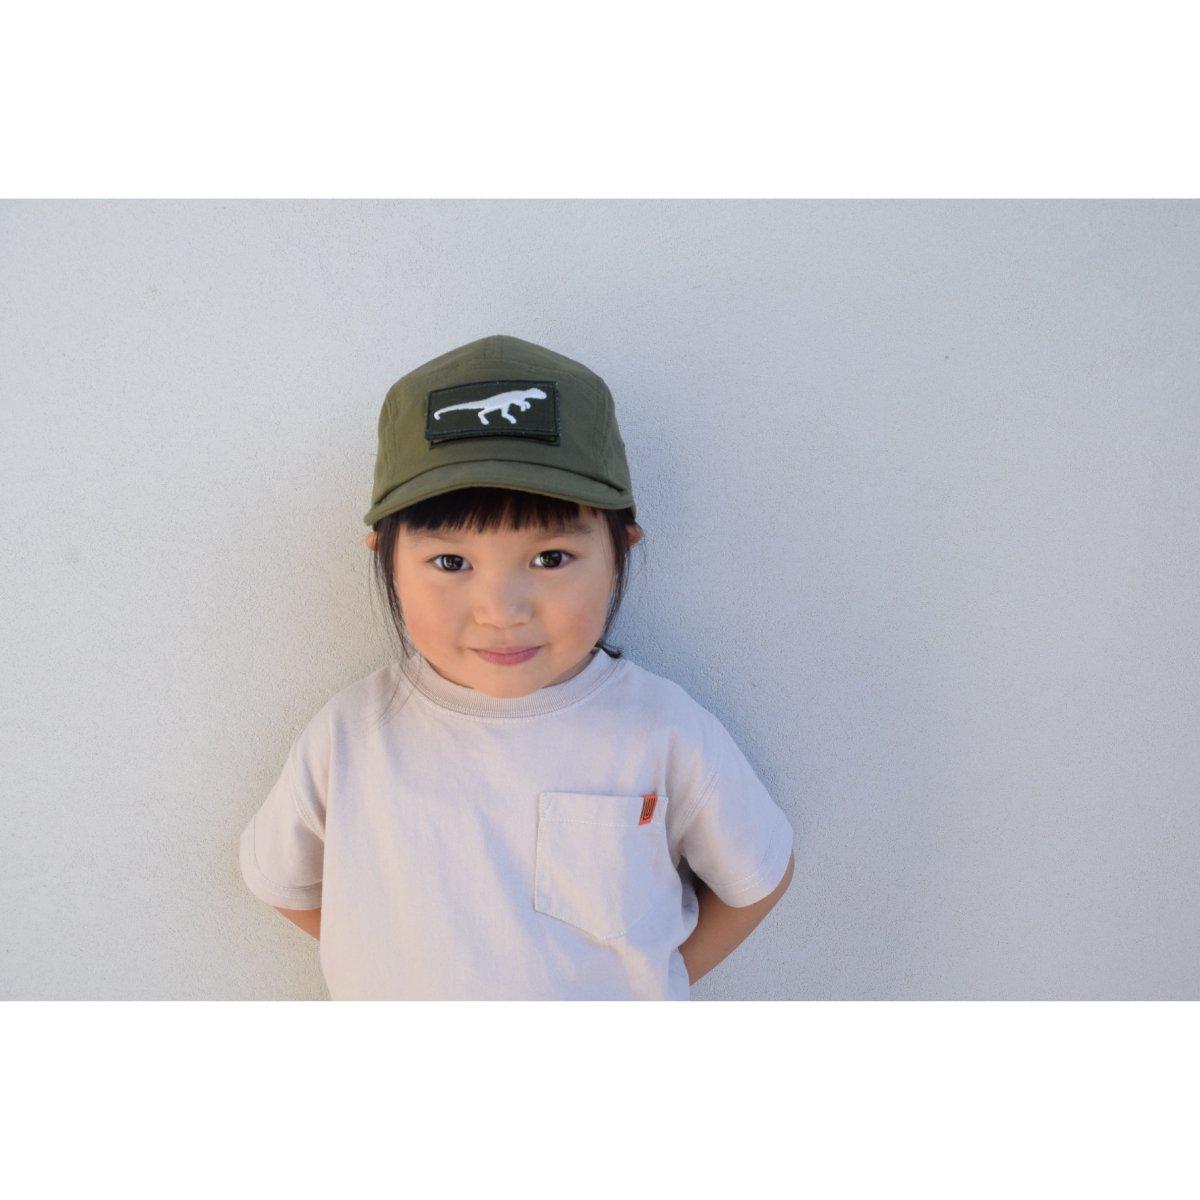 【KIDS】Dinosaur Magic Cap 詳細画像25